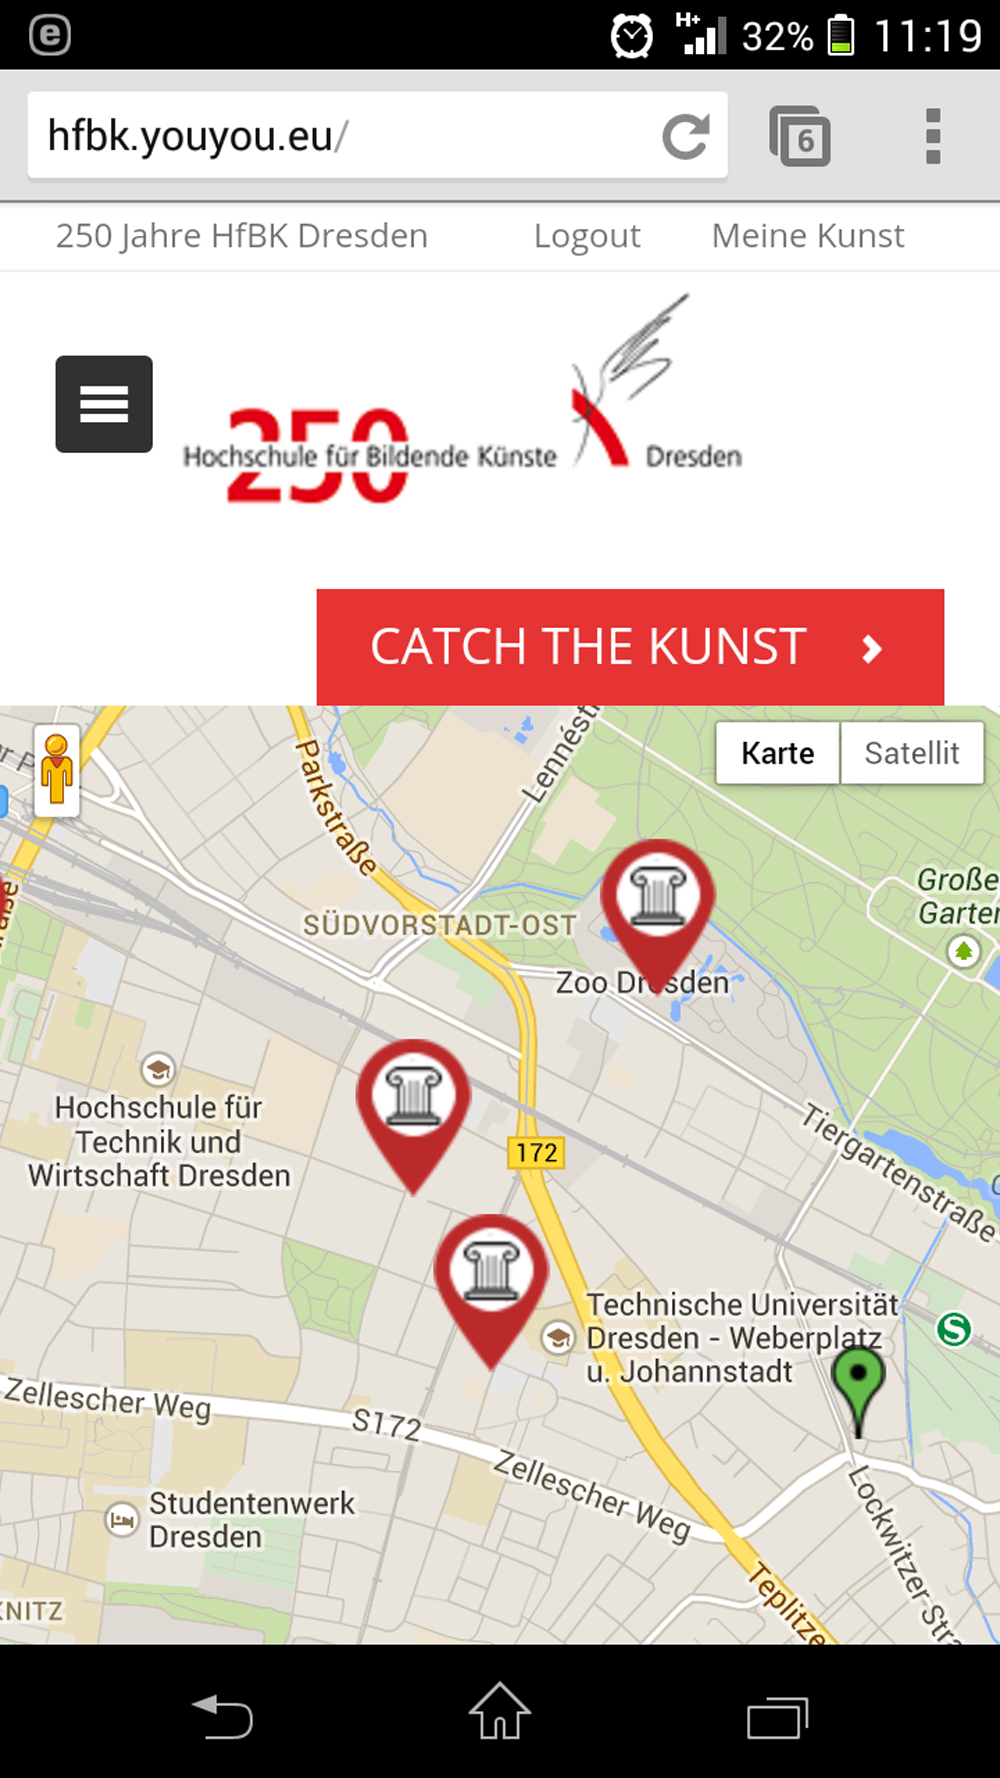 Catch the Kunst – interaktive Kunst-Schnitzeljagd